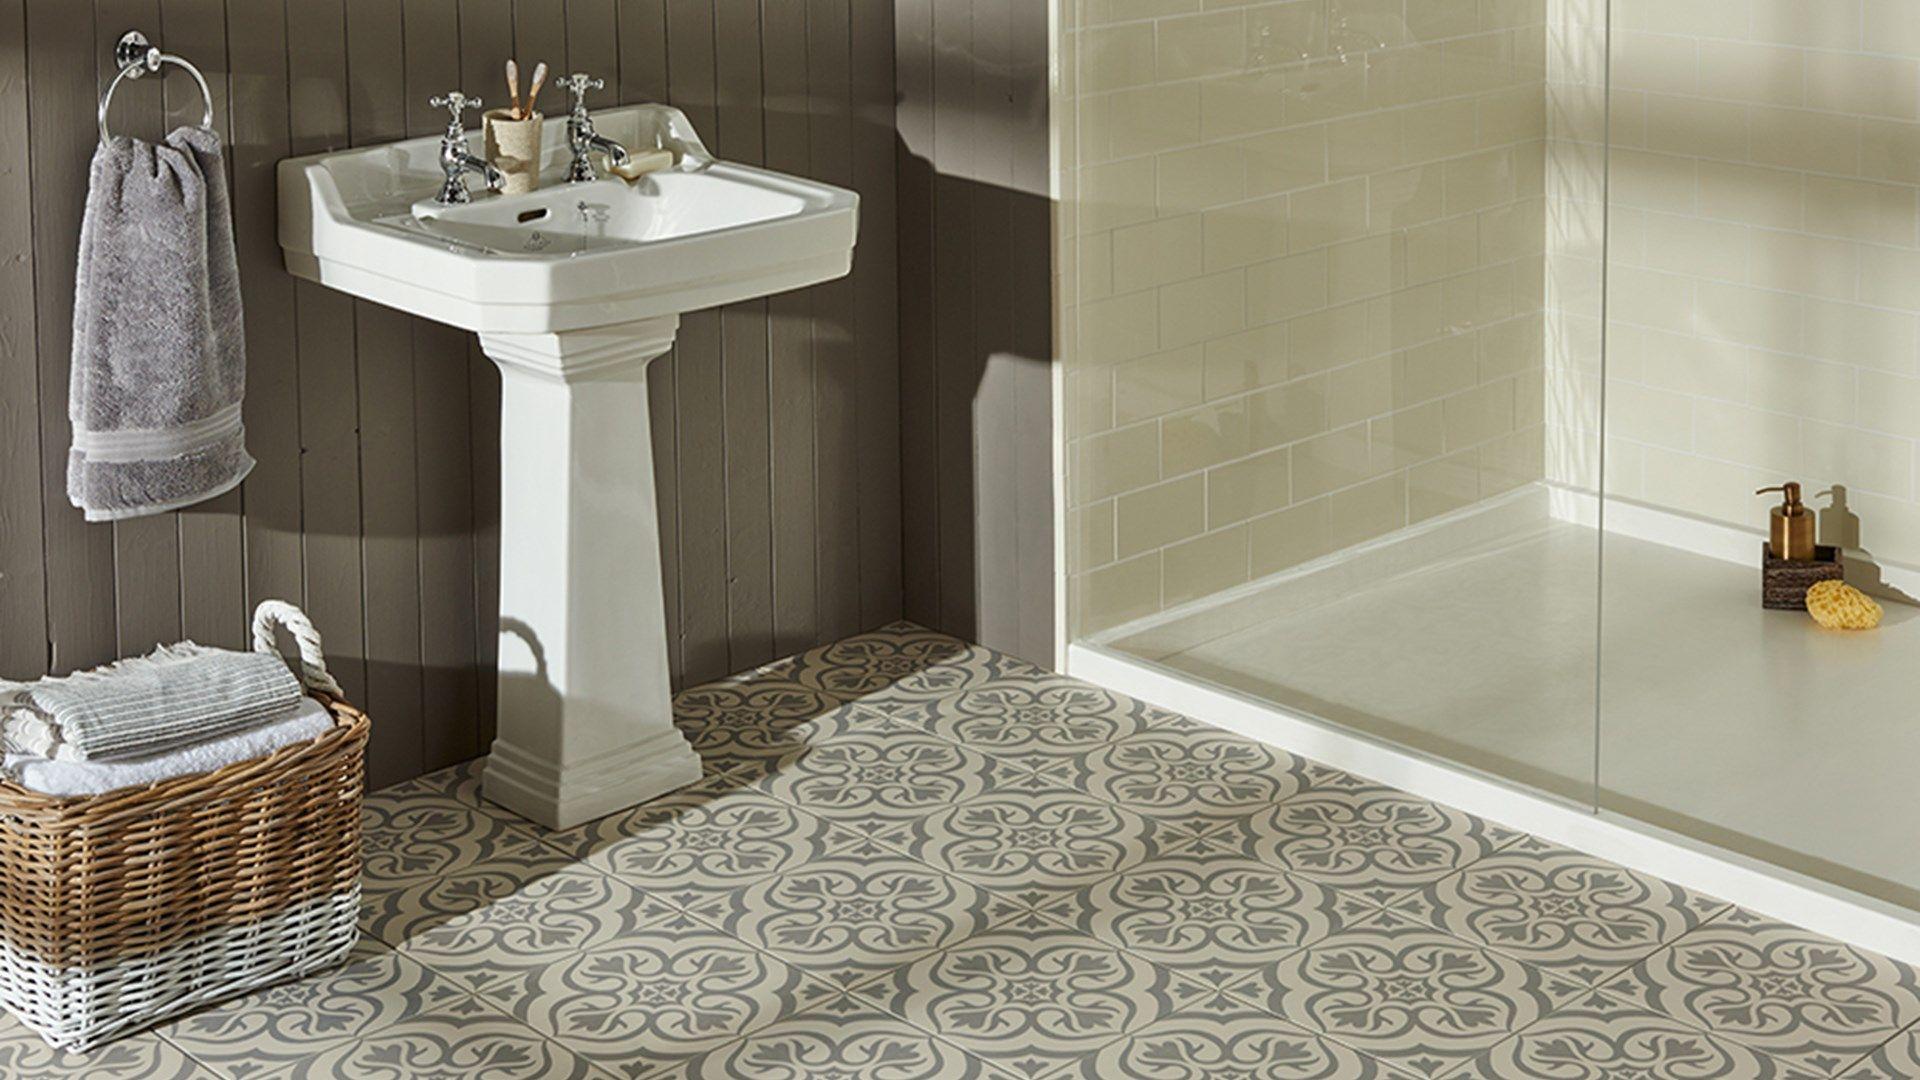 How To Create A Luxury Bathroom On A Budget Using Tiles Luxury Bathroom Budget Bathroom Tile Bathroom